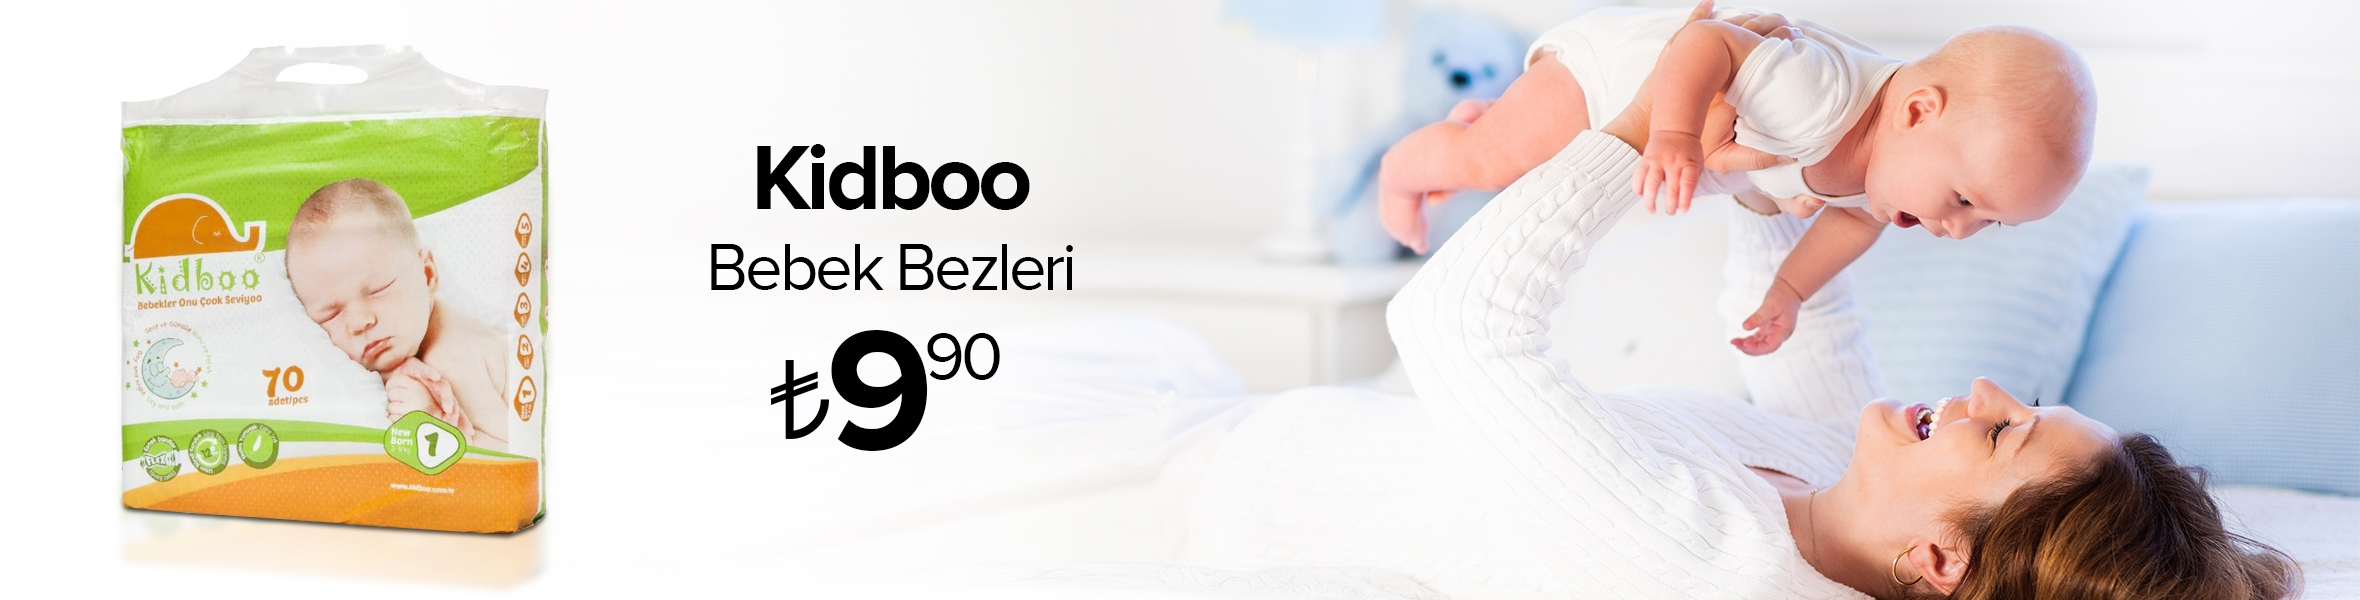 Kidboo Bebek Bezleri 9.90 TL